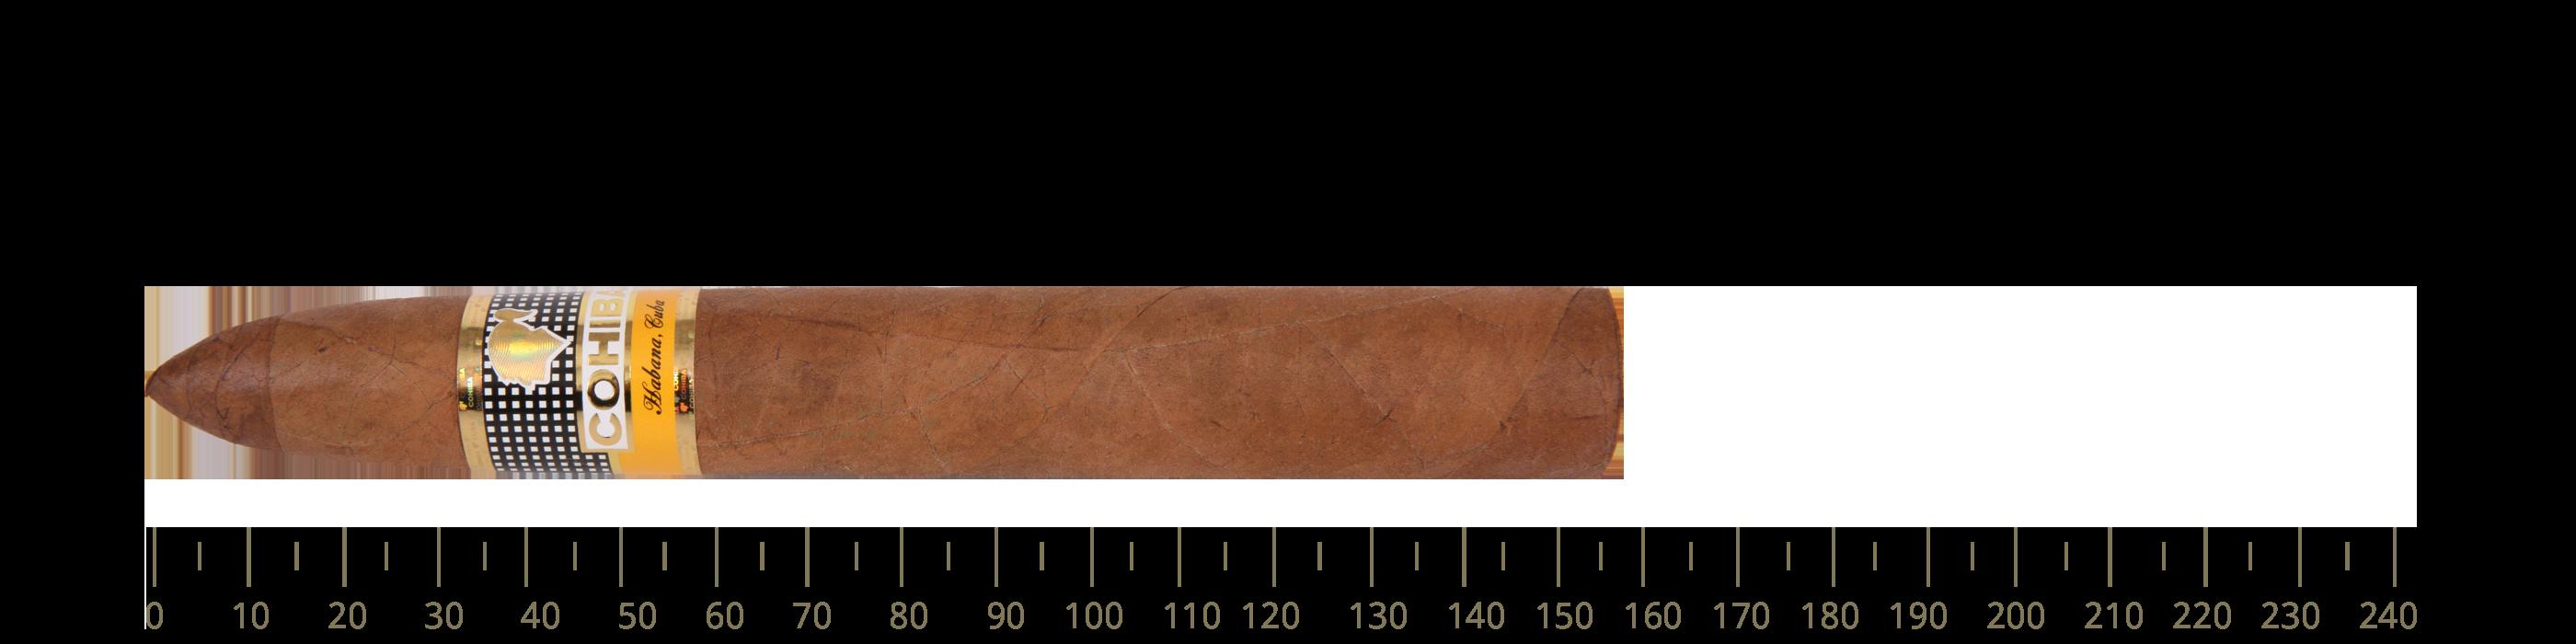 Cigar clipart vintage cigar. Combinacion seleccion piramides cigars